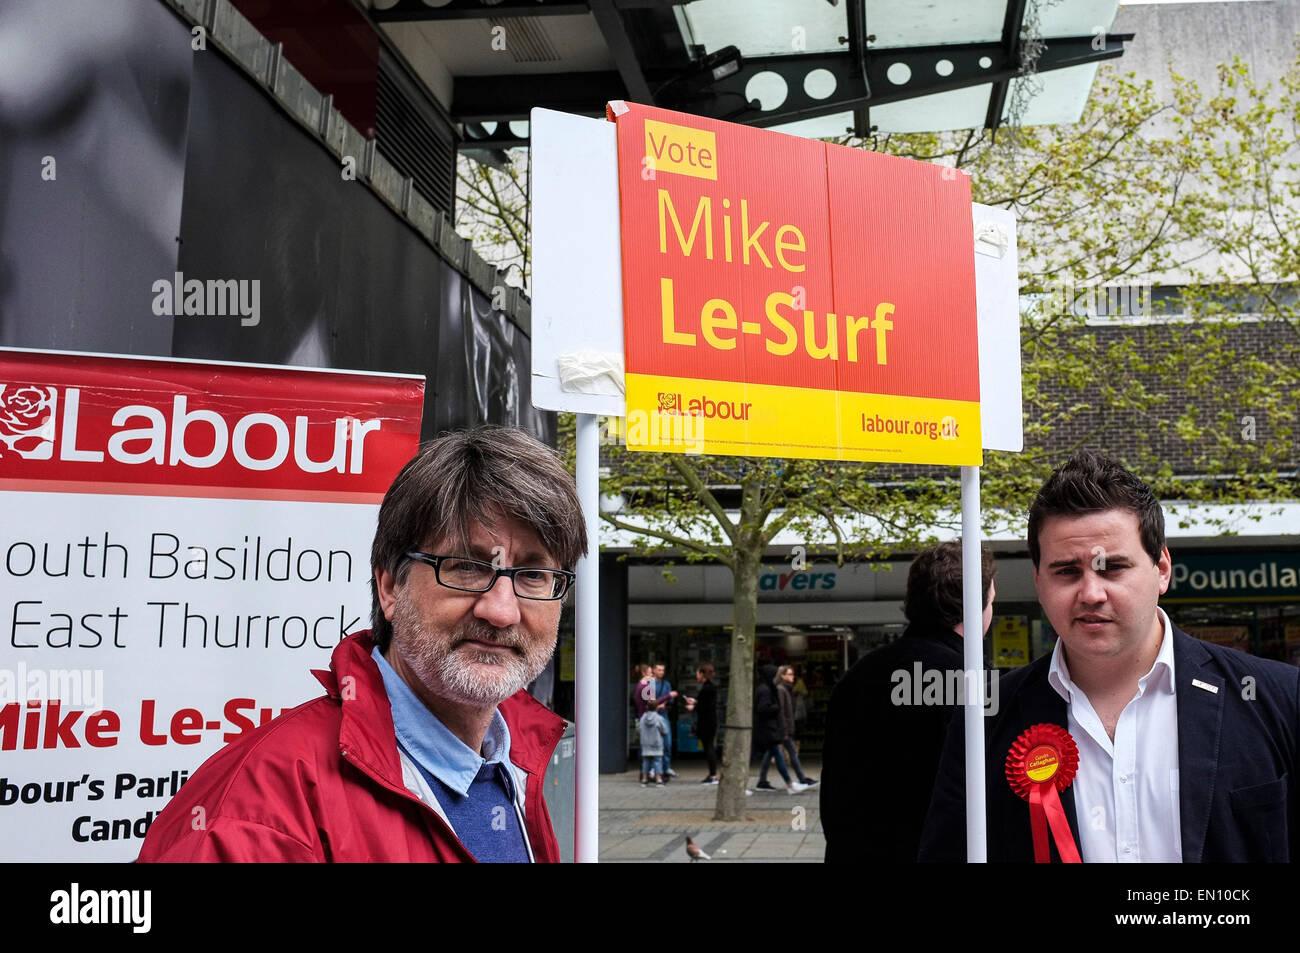 Basildon, UK. 25th Apr, 2015. Saturday 25th April, 2015. Basildon. Mike Le-Surf, prospective candidate - Stock Image